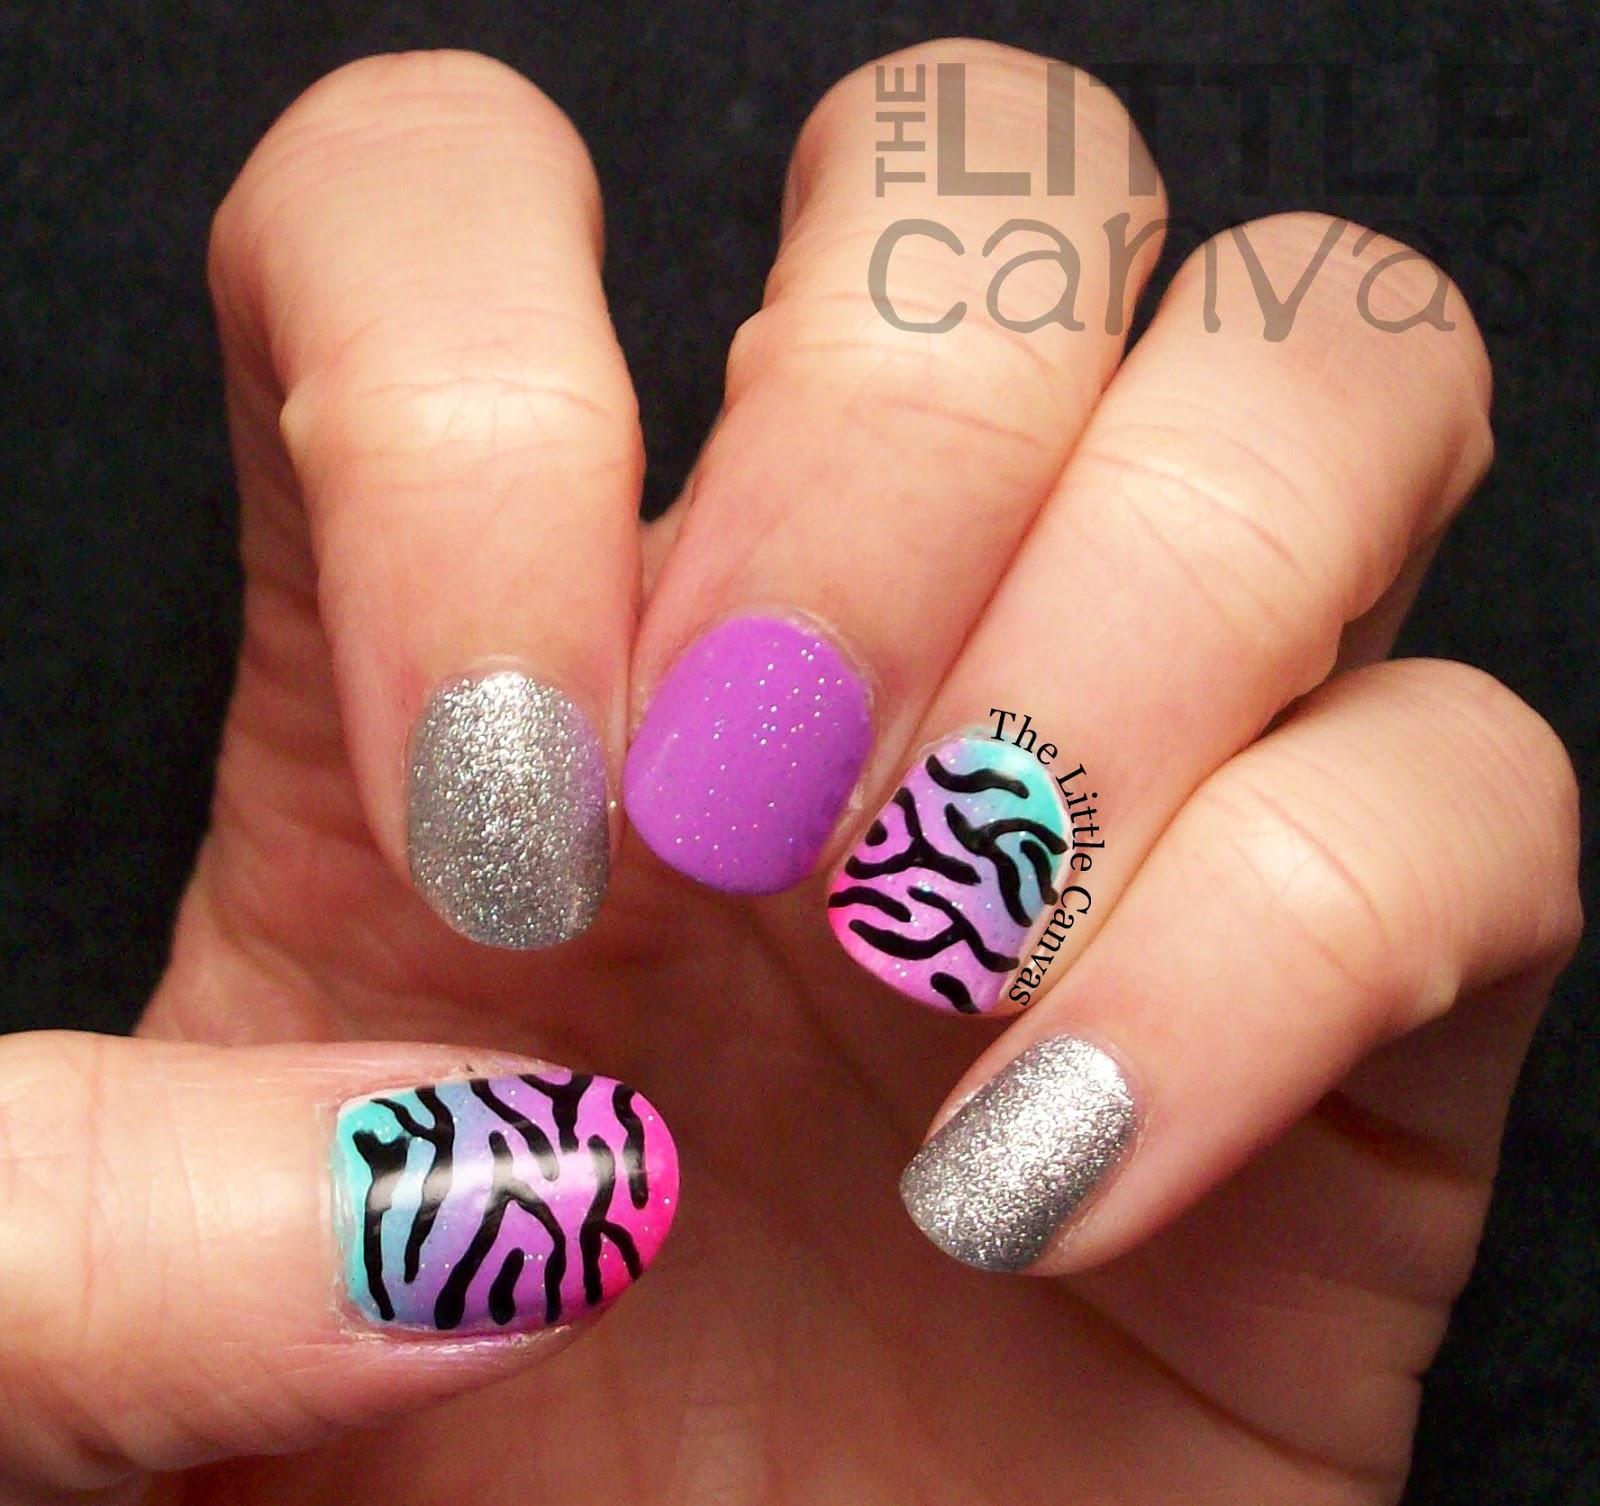 Neon Gradient with Zebra Print - The Little Canvas